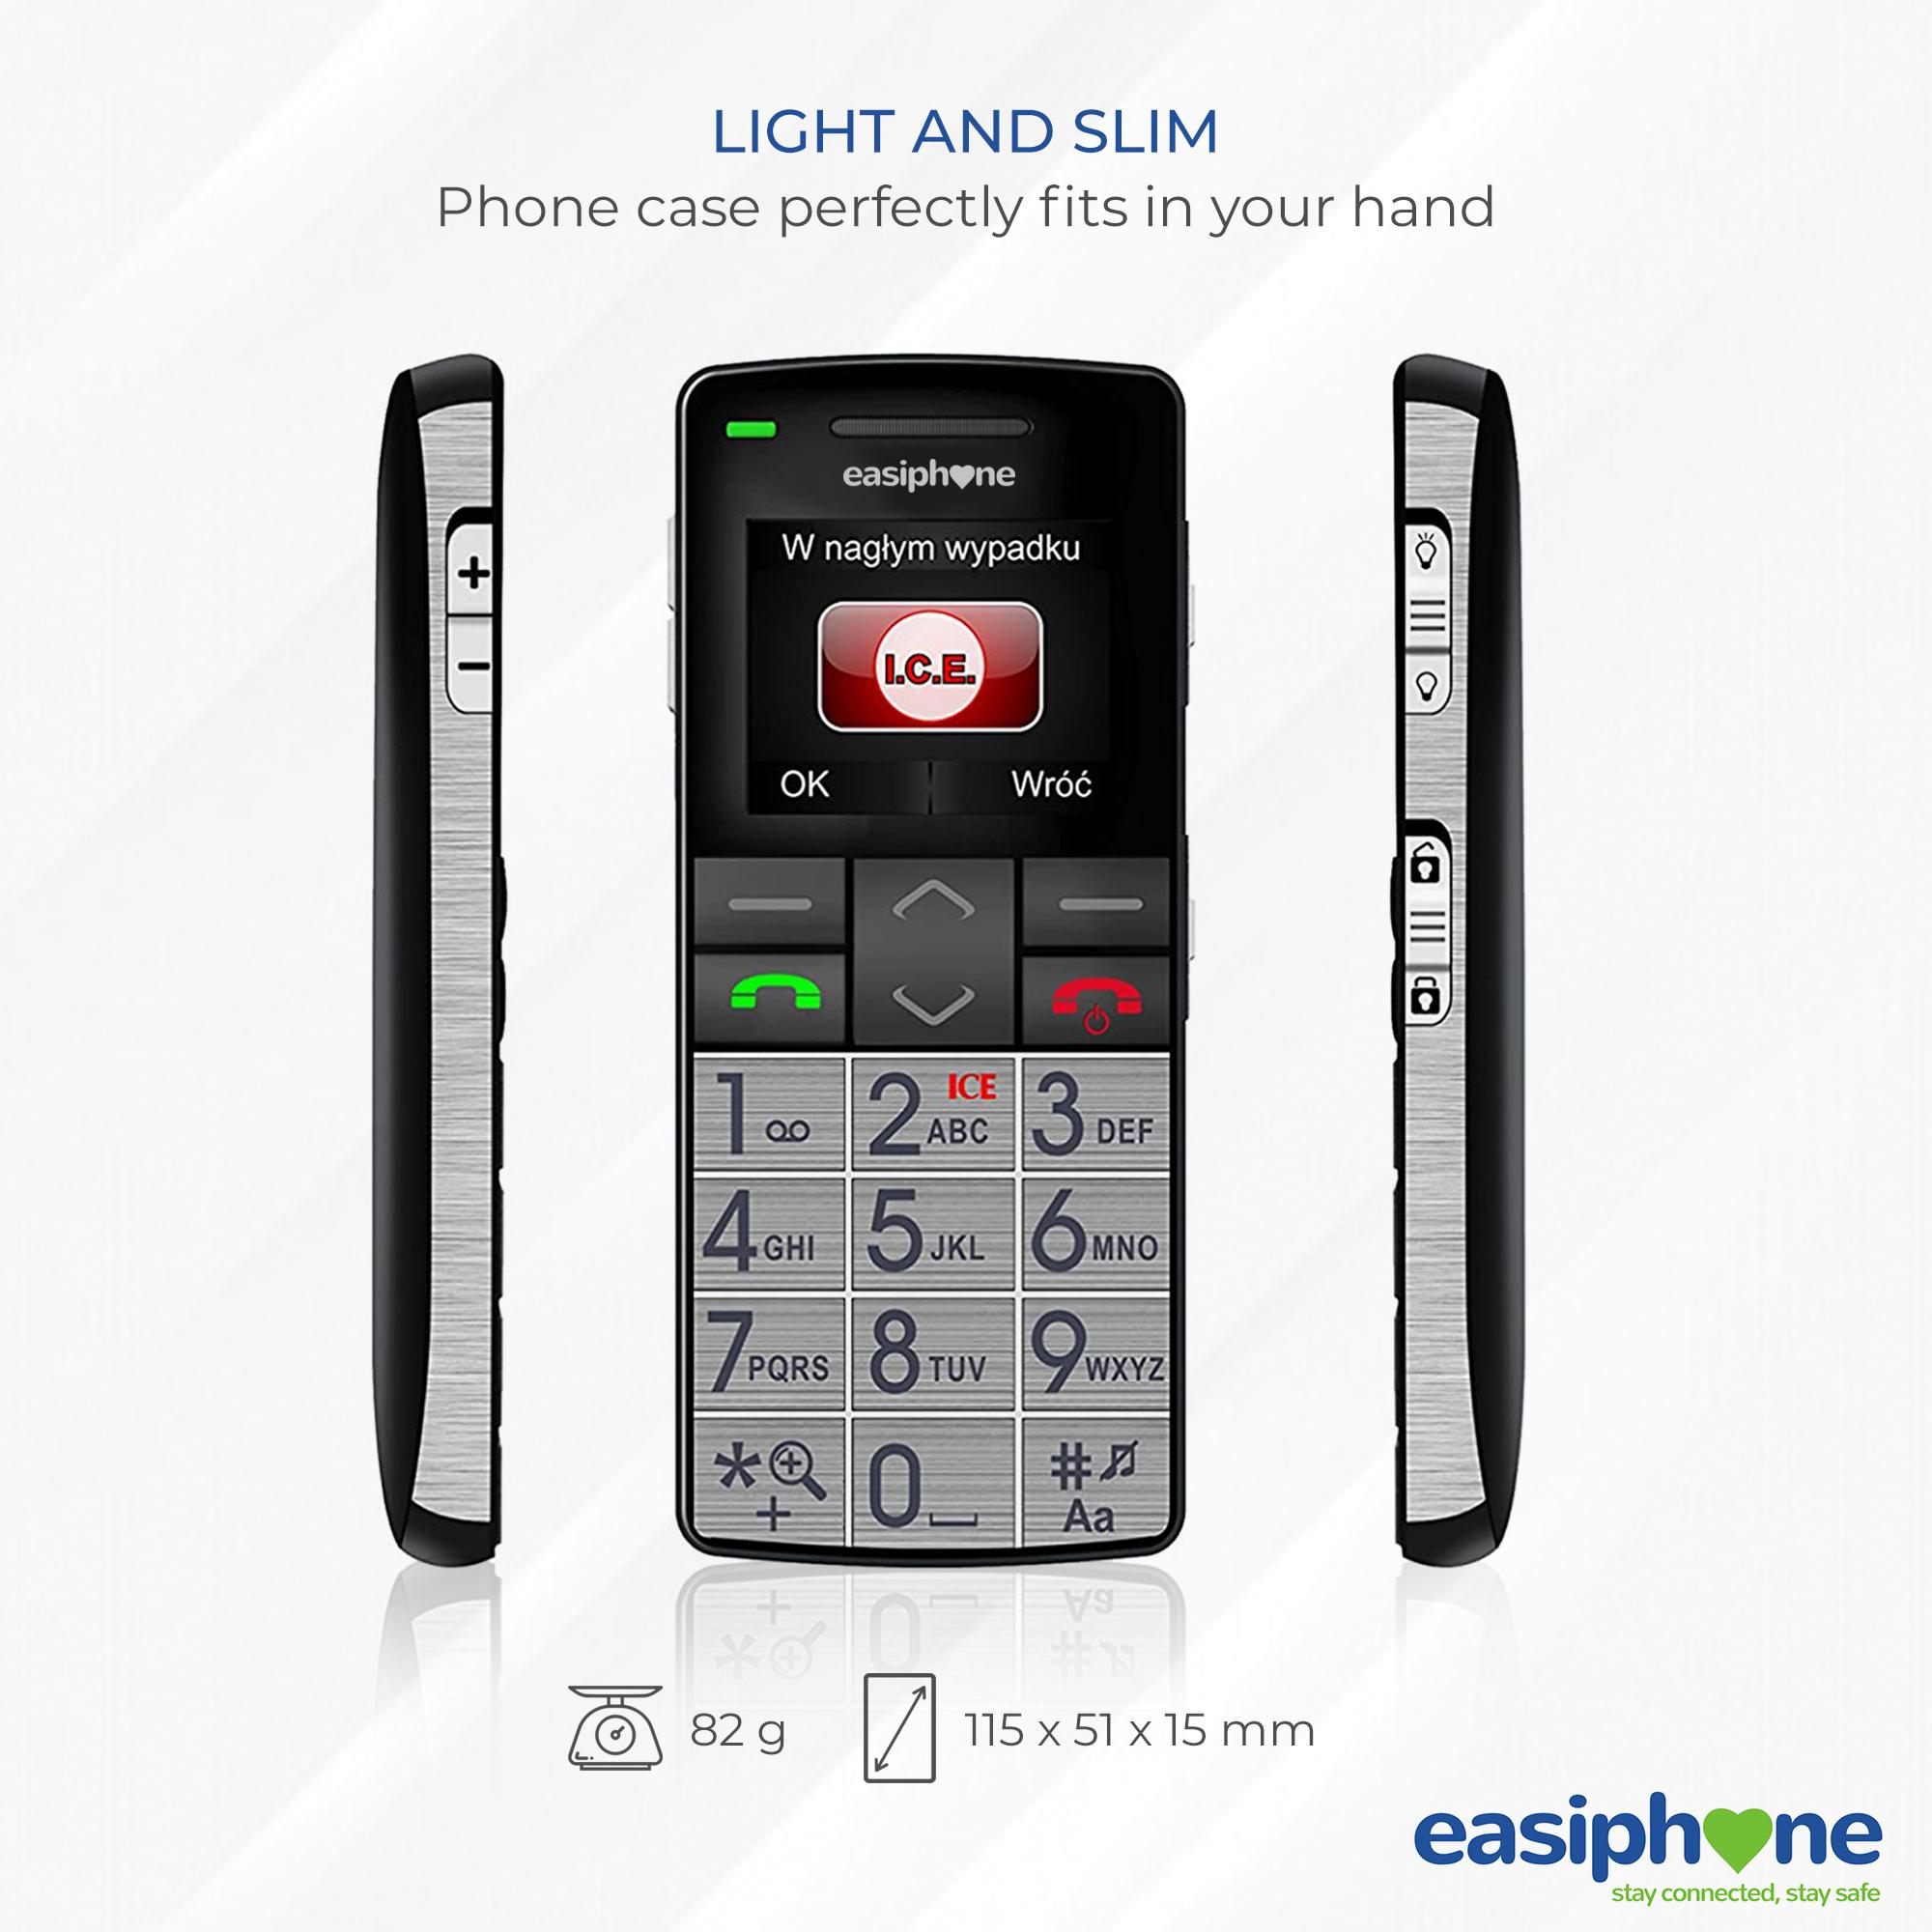 Easyphone 715